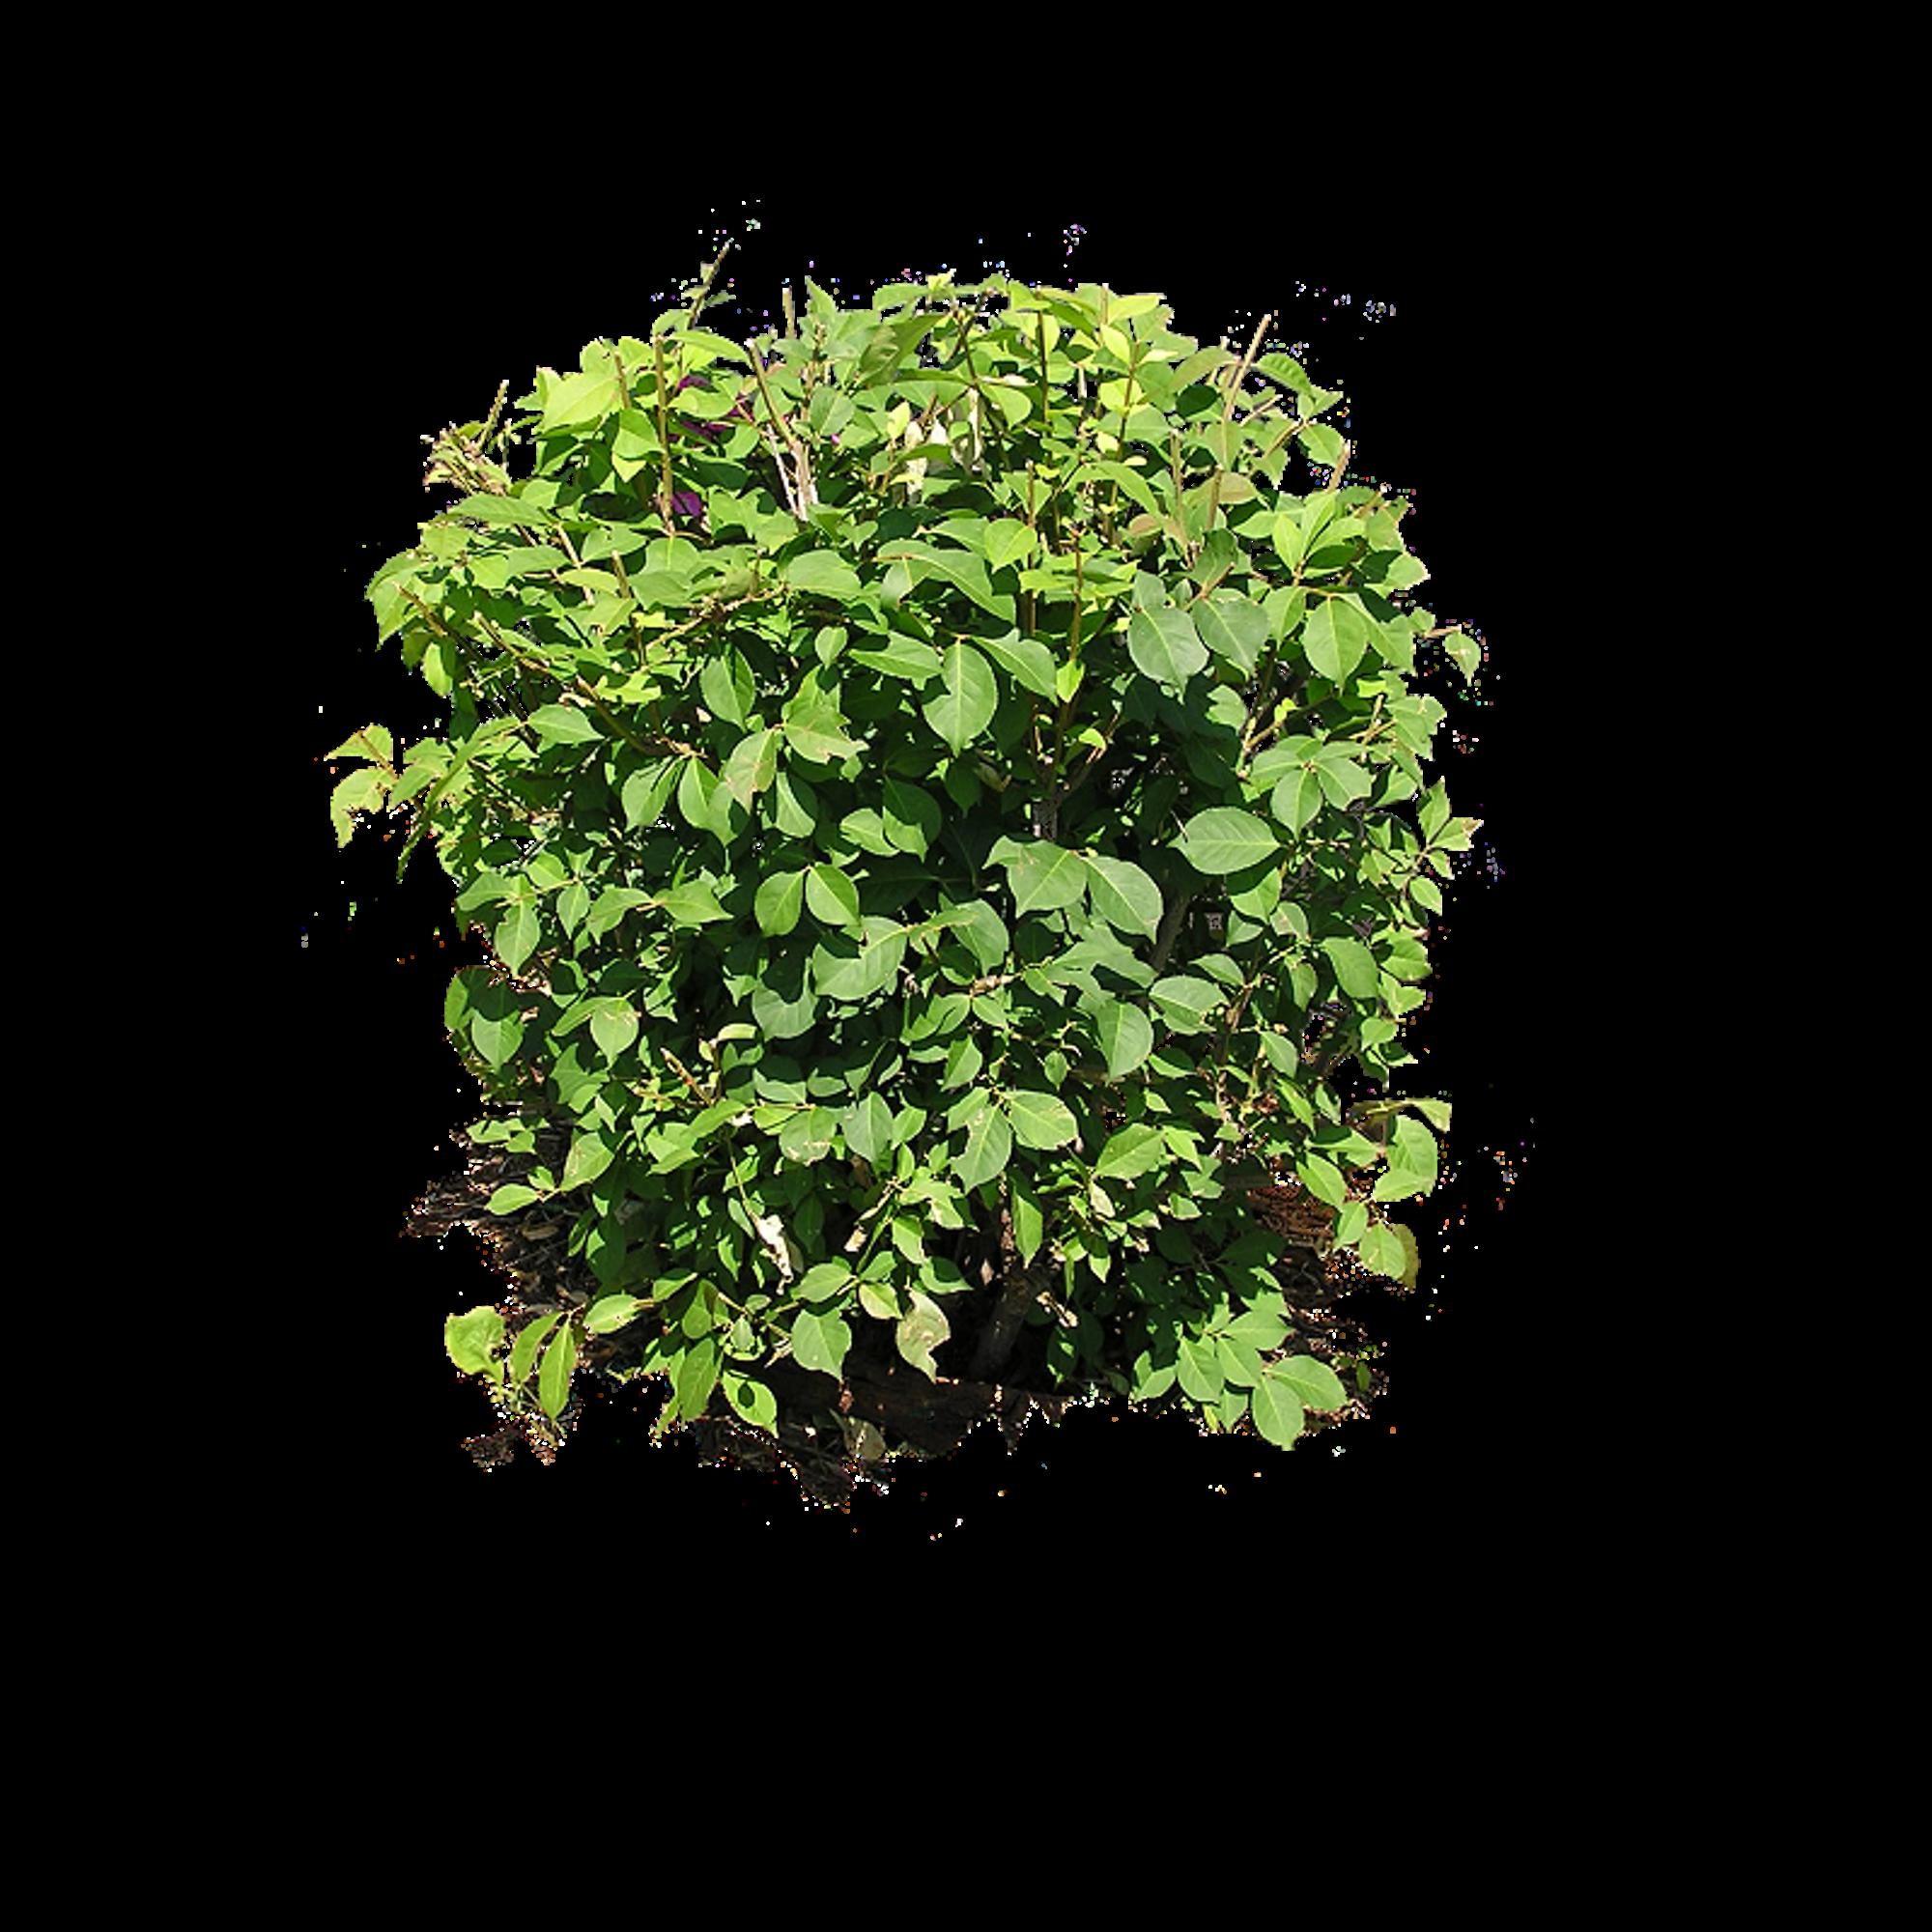 Bush png image purepng. Grass clipart shrub